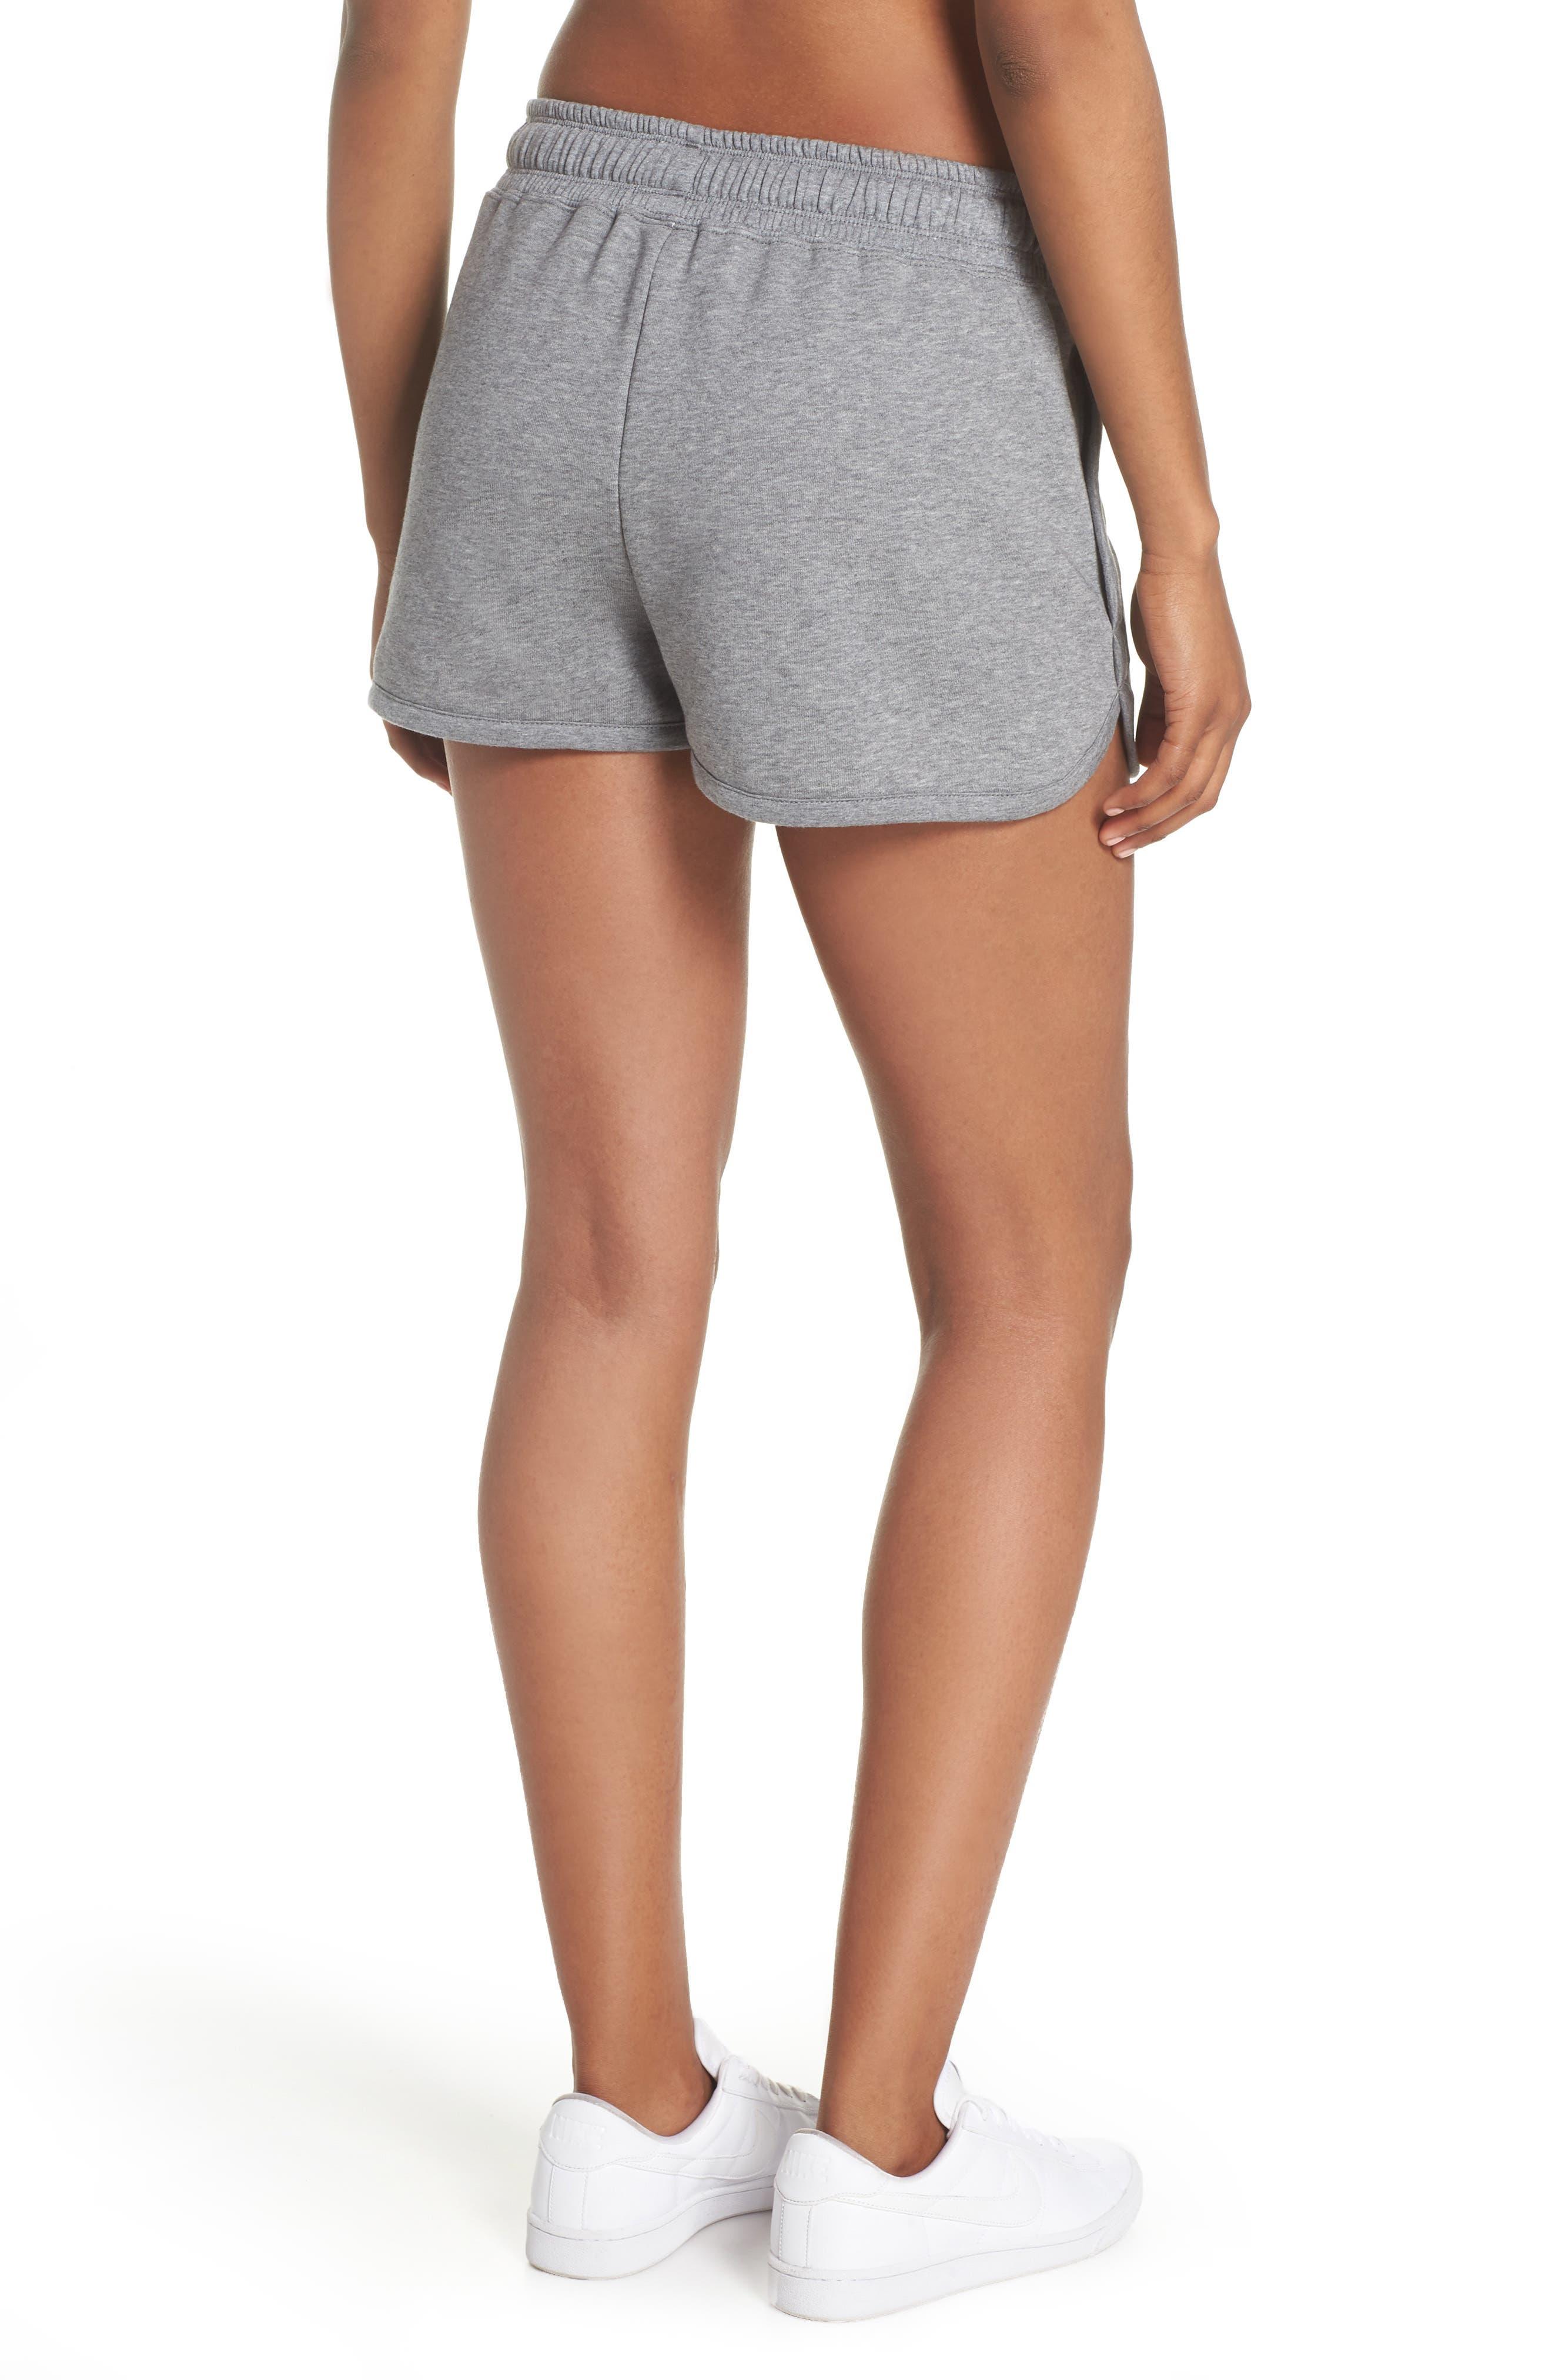 Sportswear Air Gym Shorts,                             Alternate thumbnail 2, color,